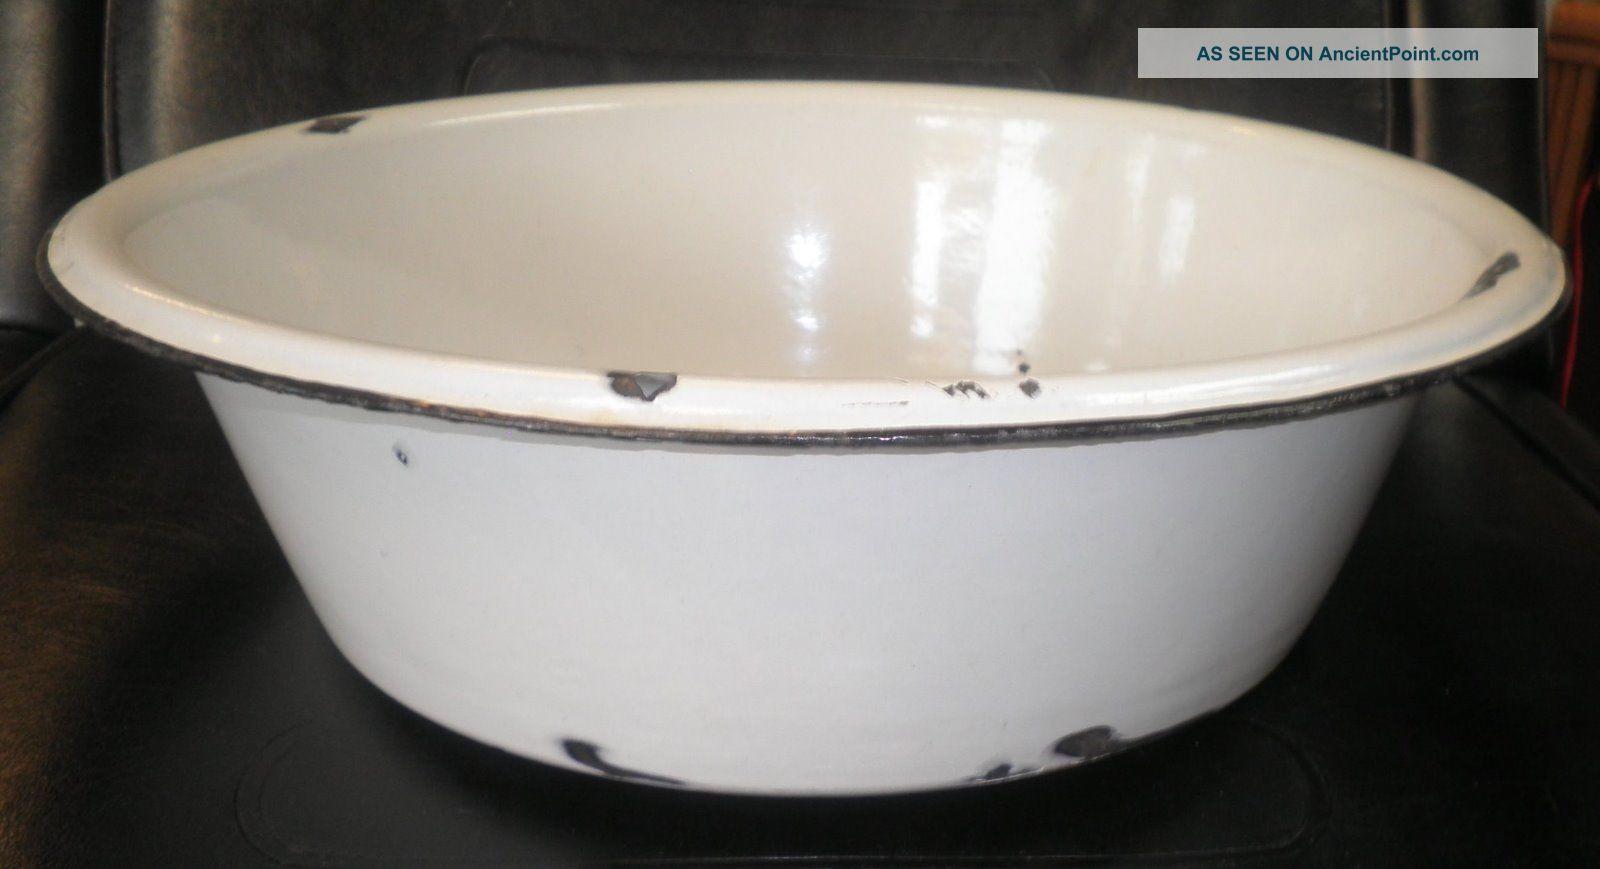 ... Antique Porcelain Enamel Wash Tub Basin Black Rim Primitives photo 1